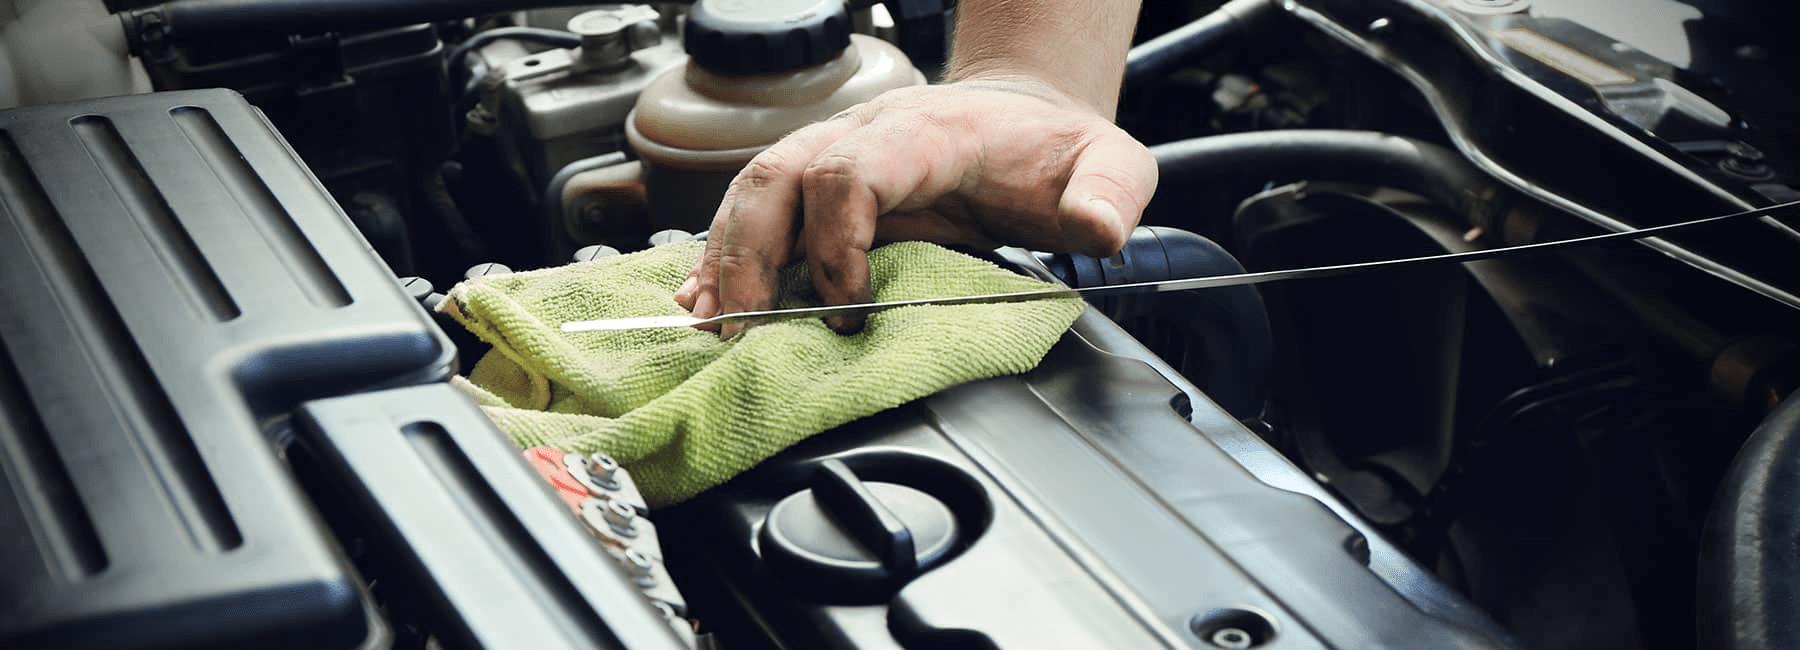 man checks oil level in car engine